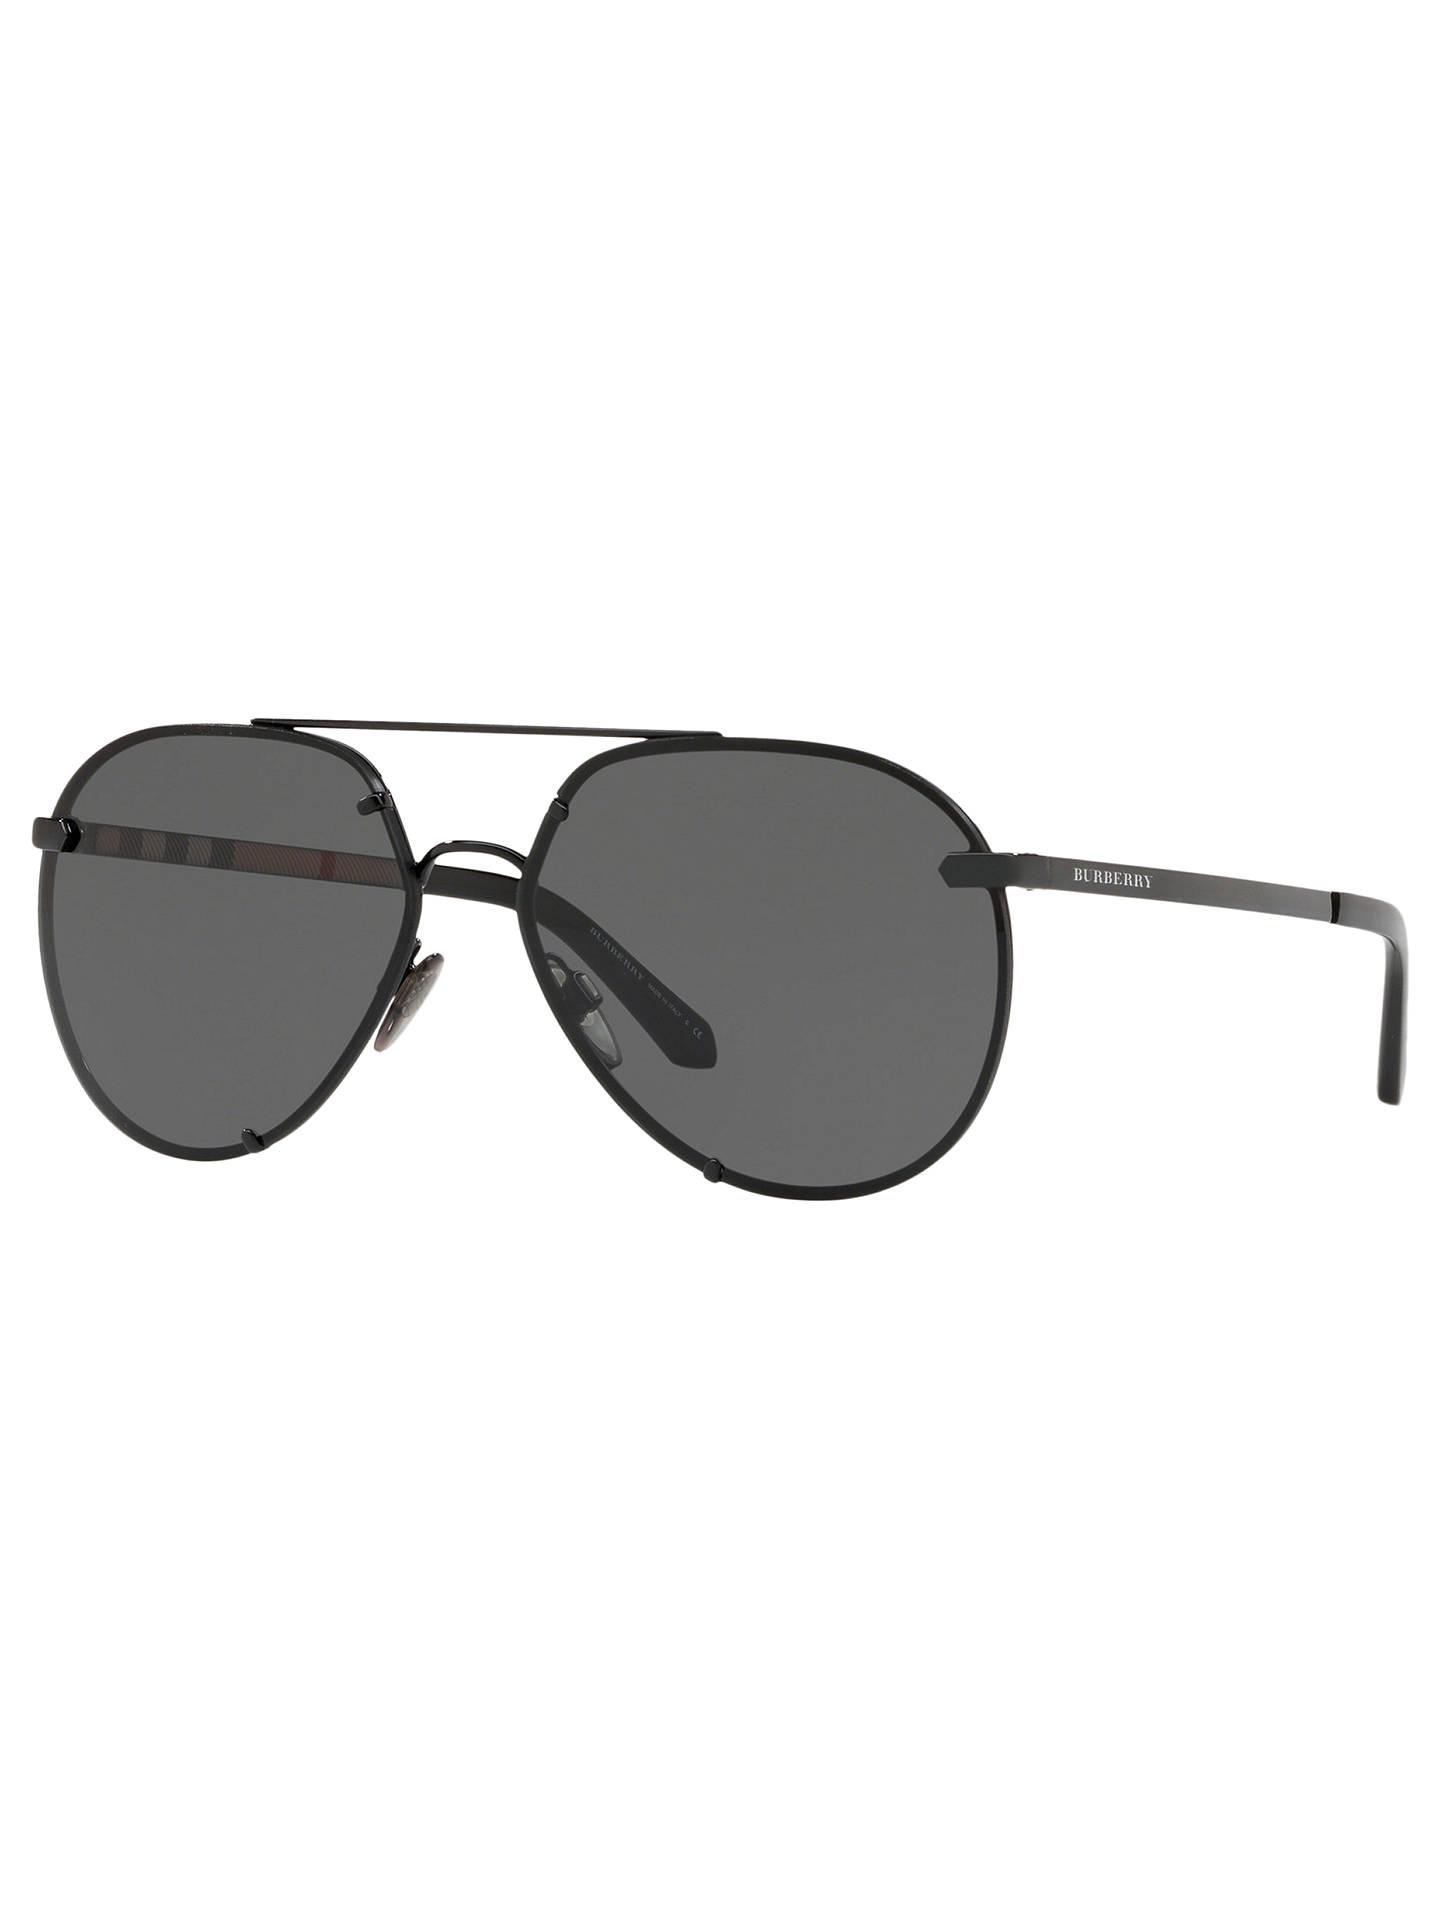 fa26b078c86 Burberry BE3099 Women s Aviator Sunglasses at John Lewis   Partners